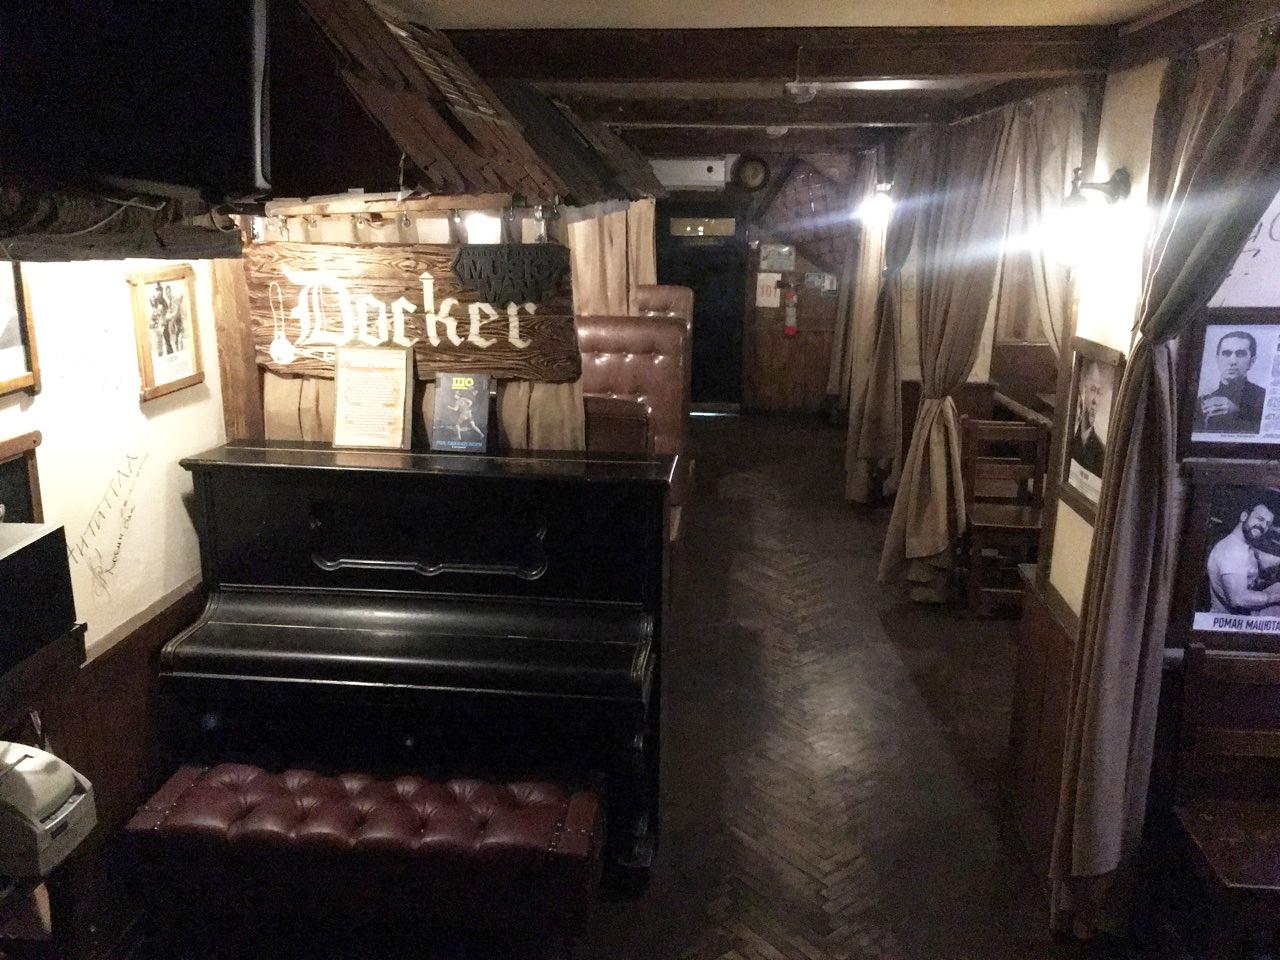 Docker's ABС интерьер залов